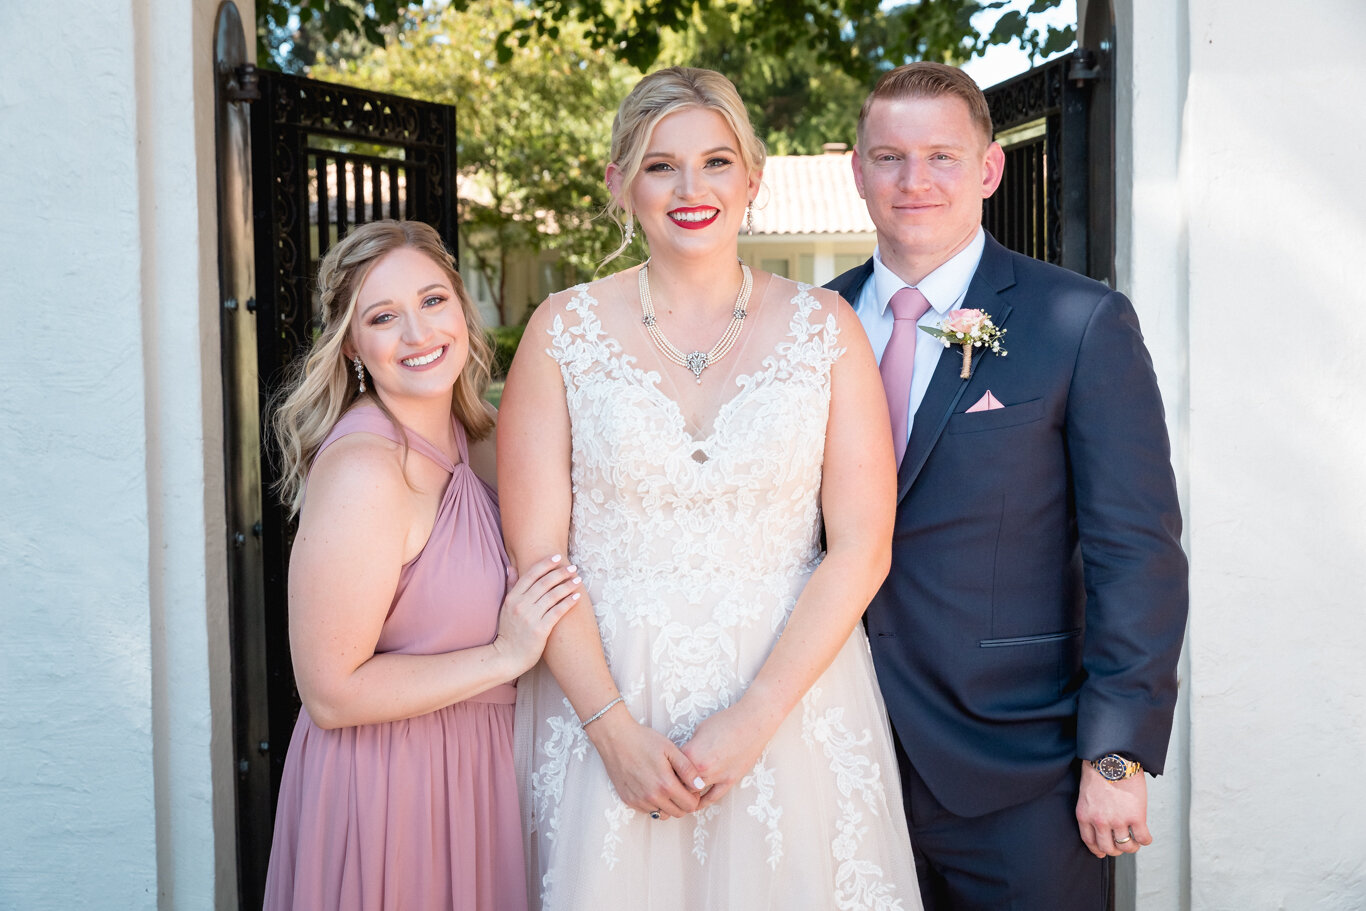 2019.08.24_Emily-Ashir-Wedding-at-the-Maples-5494.jpg